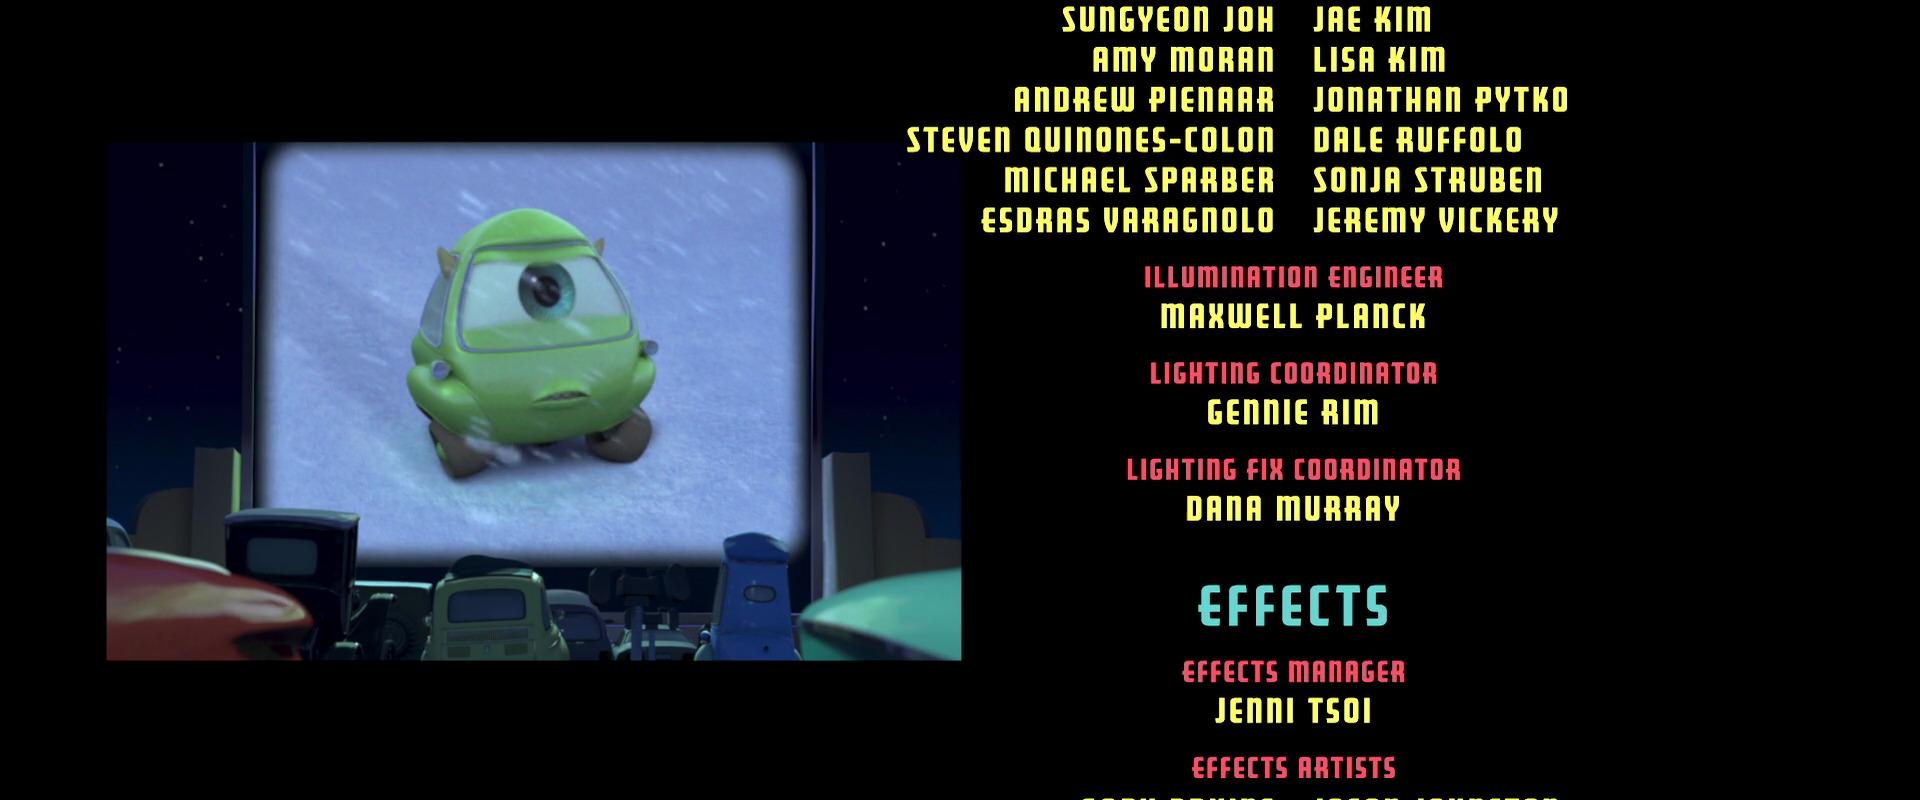 bob mike personnage character pixar disney cars